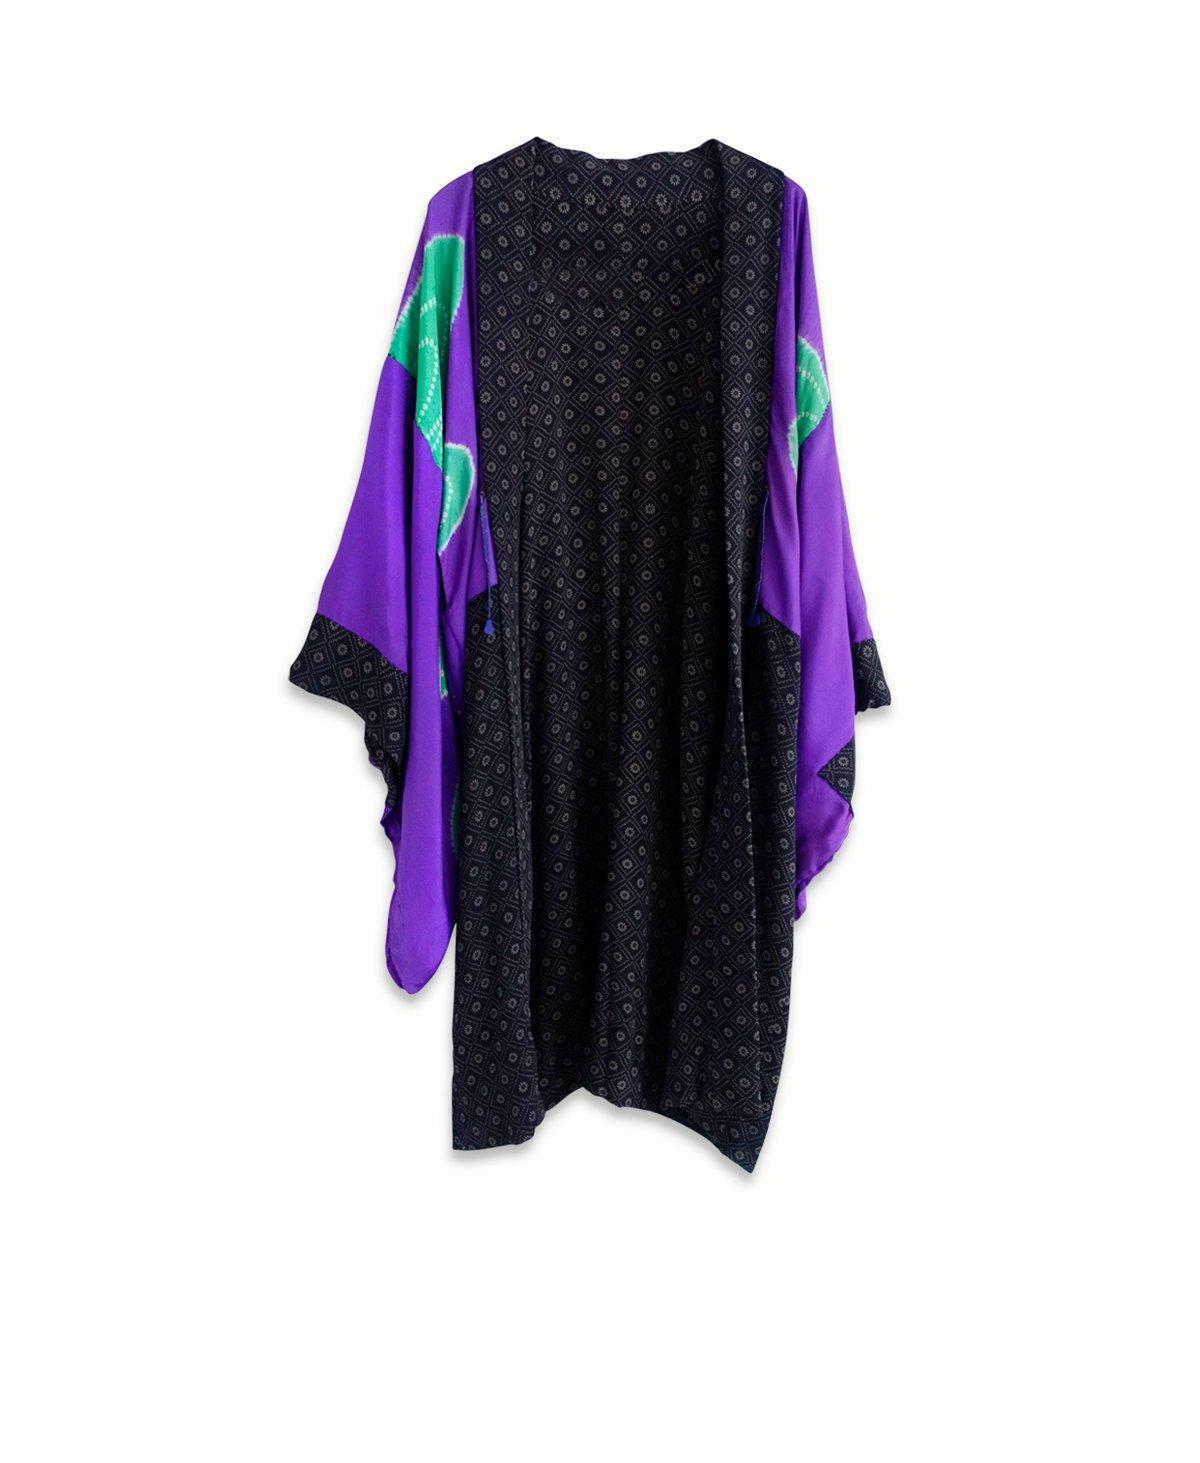 Image of NY: Kort kimono - sortbrun m. mønster og lilla for